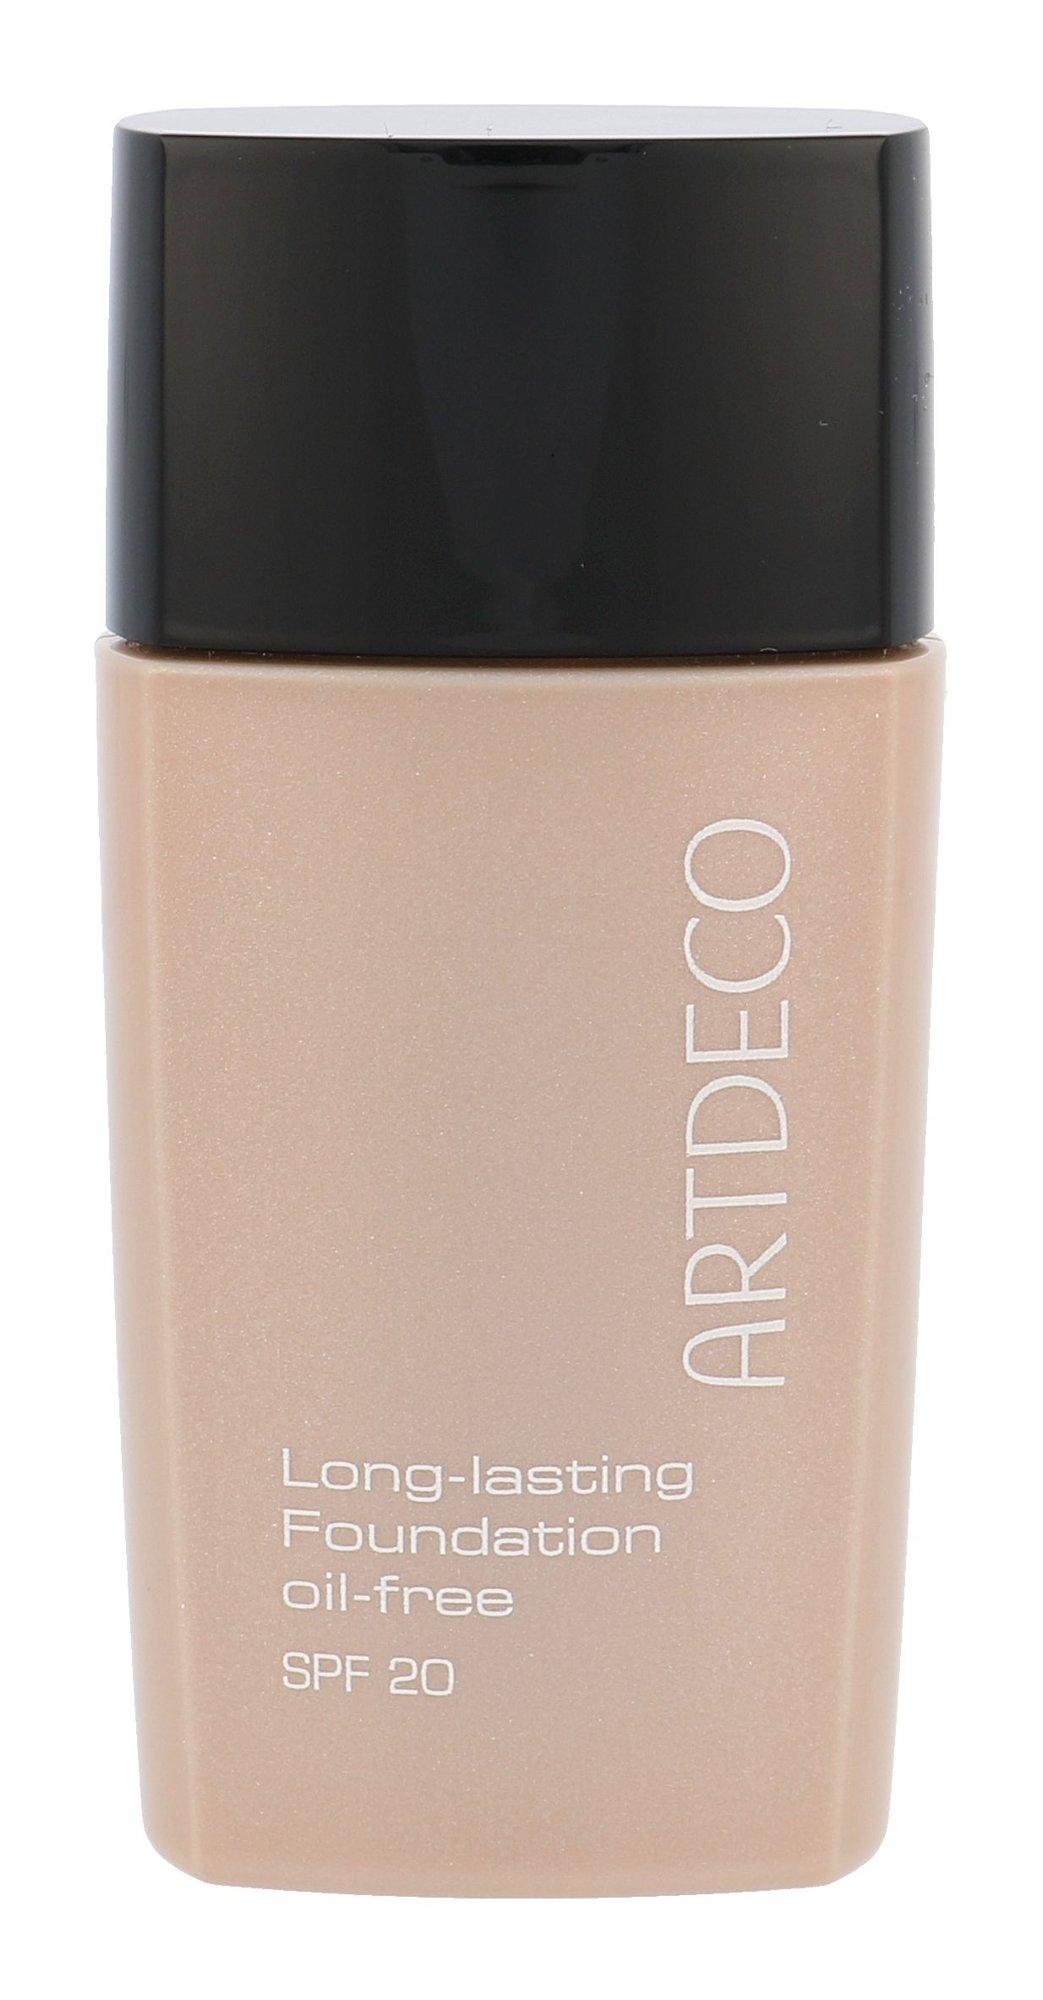 Artdeco Long Lasting Foundation Oil-Free Cosmetic 30ml 30 Natural Shell